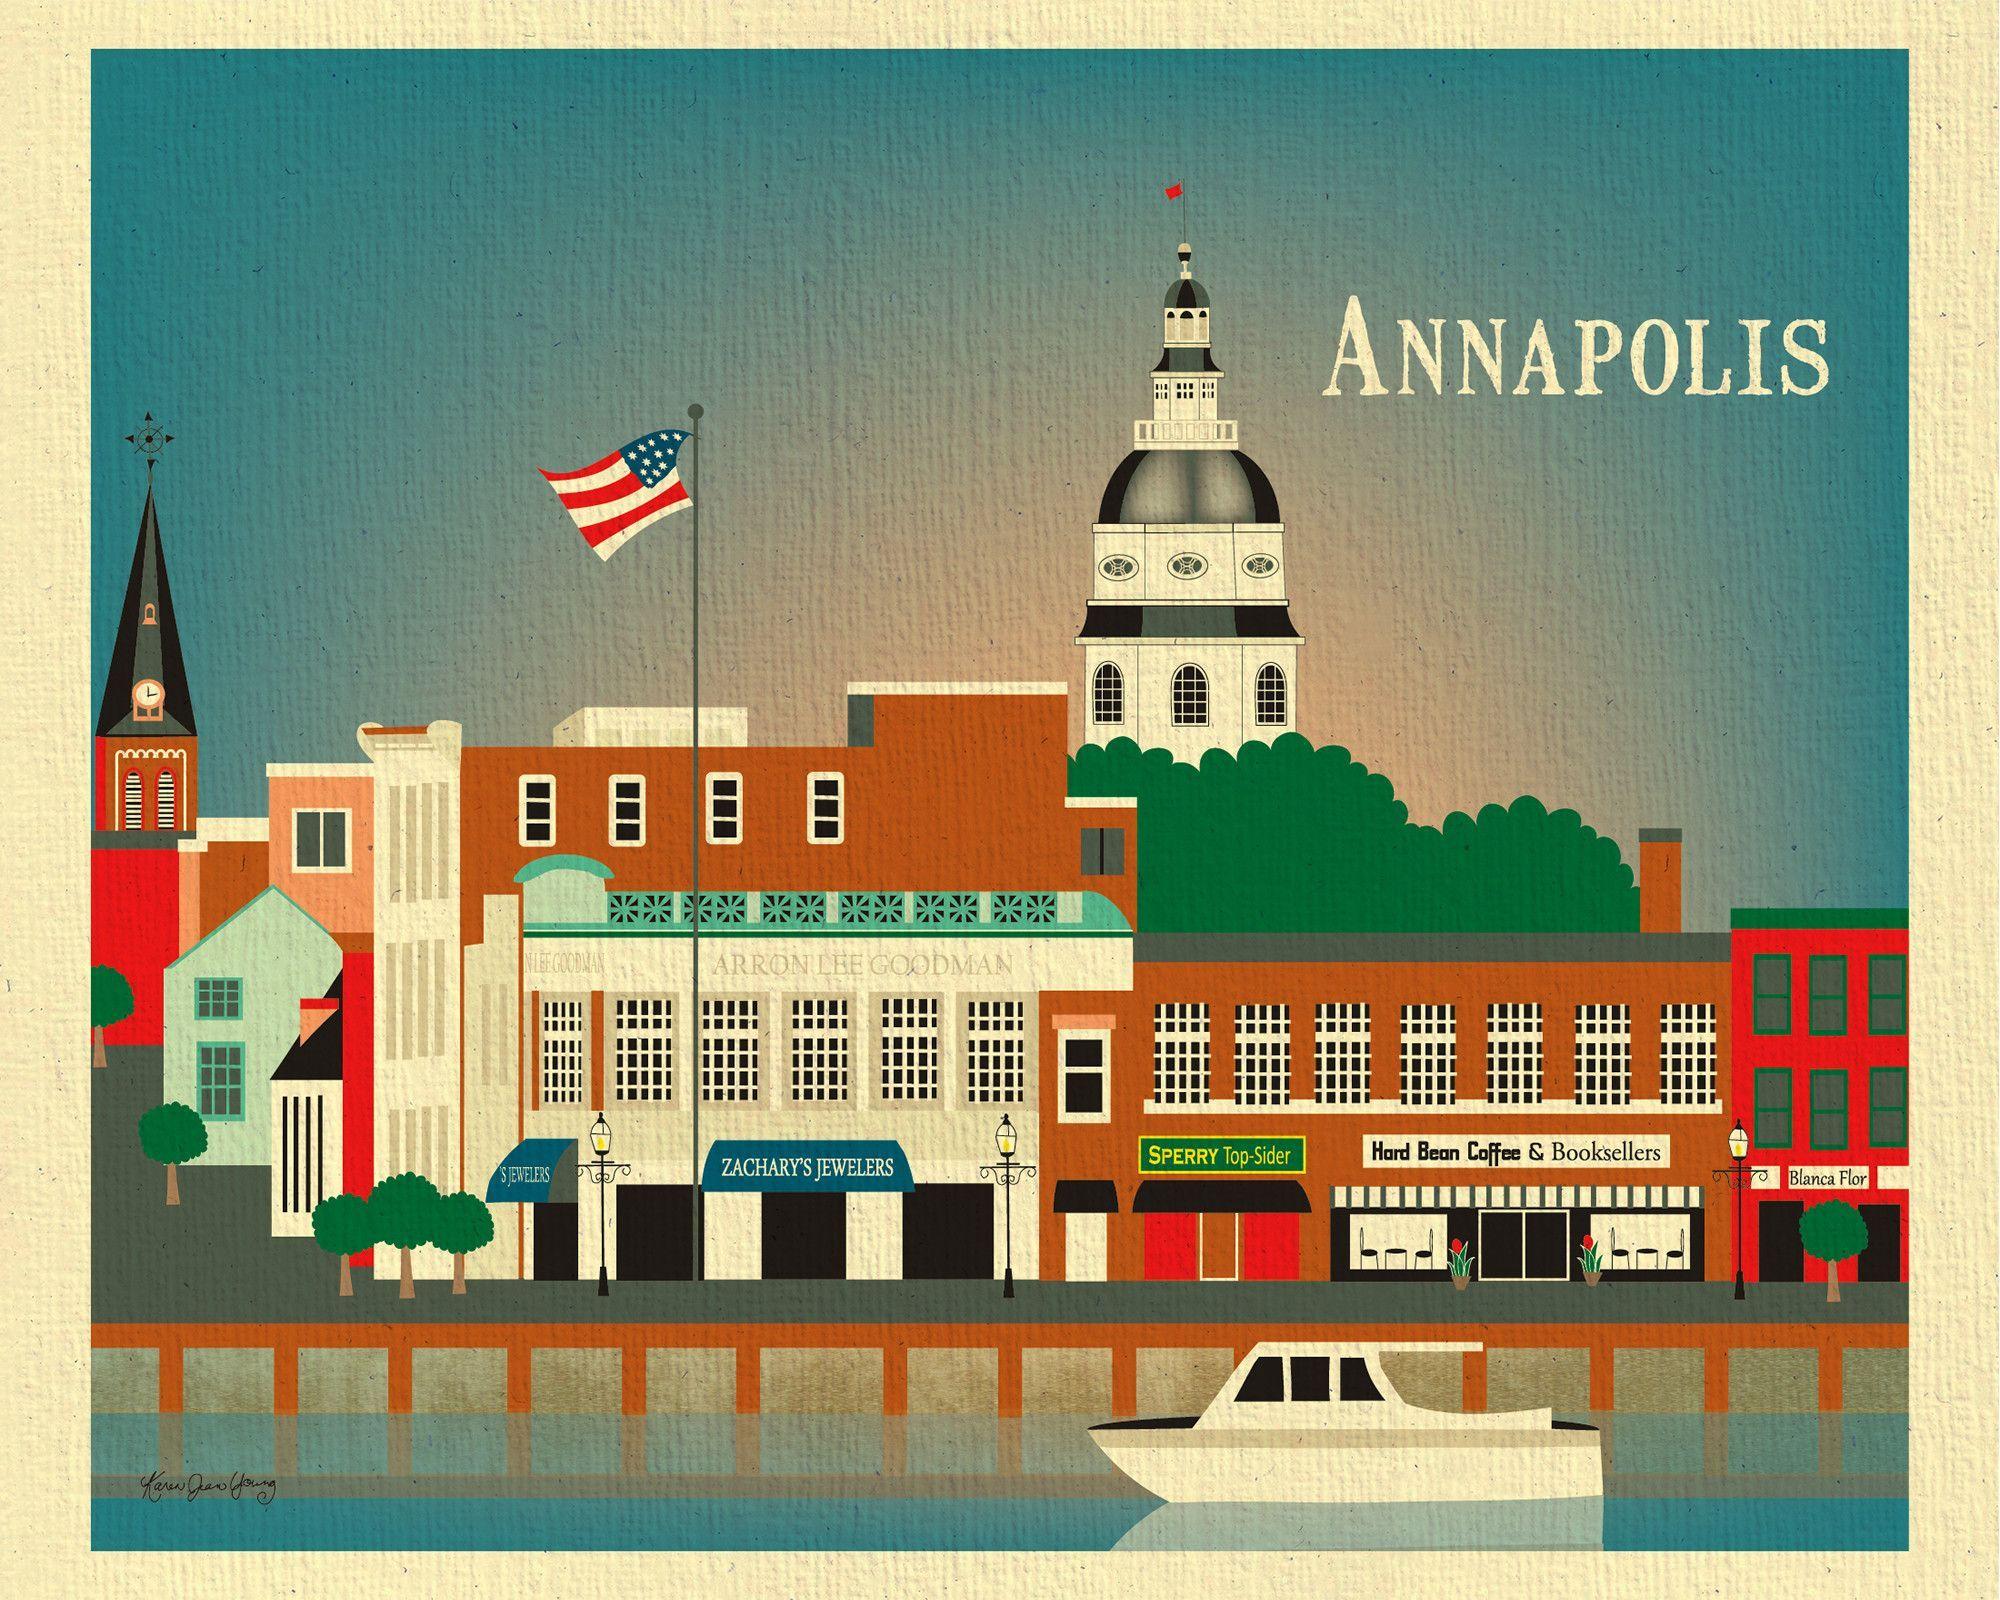 Annapolis Maryland Art City Prints Annapolis Maryland Annapolis